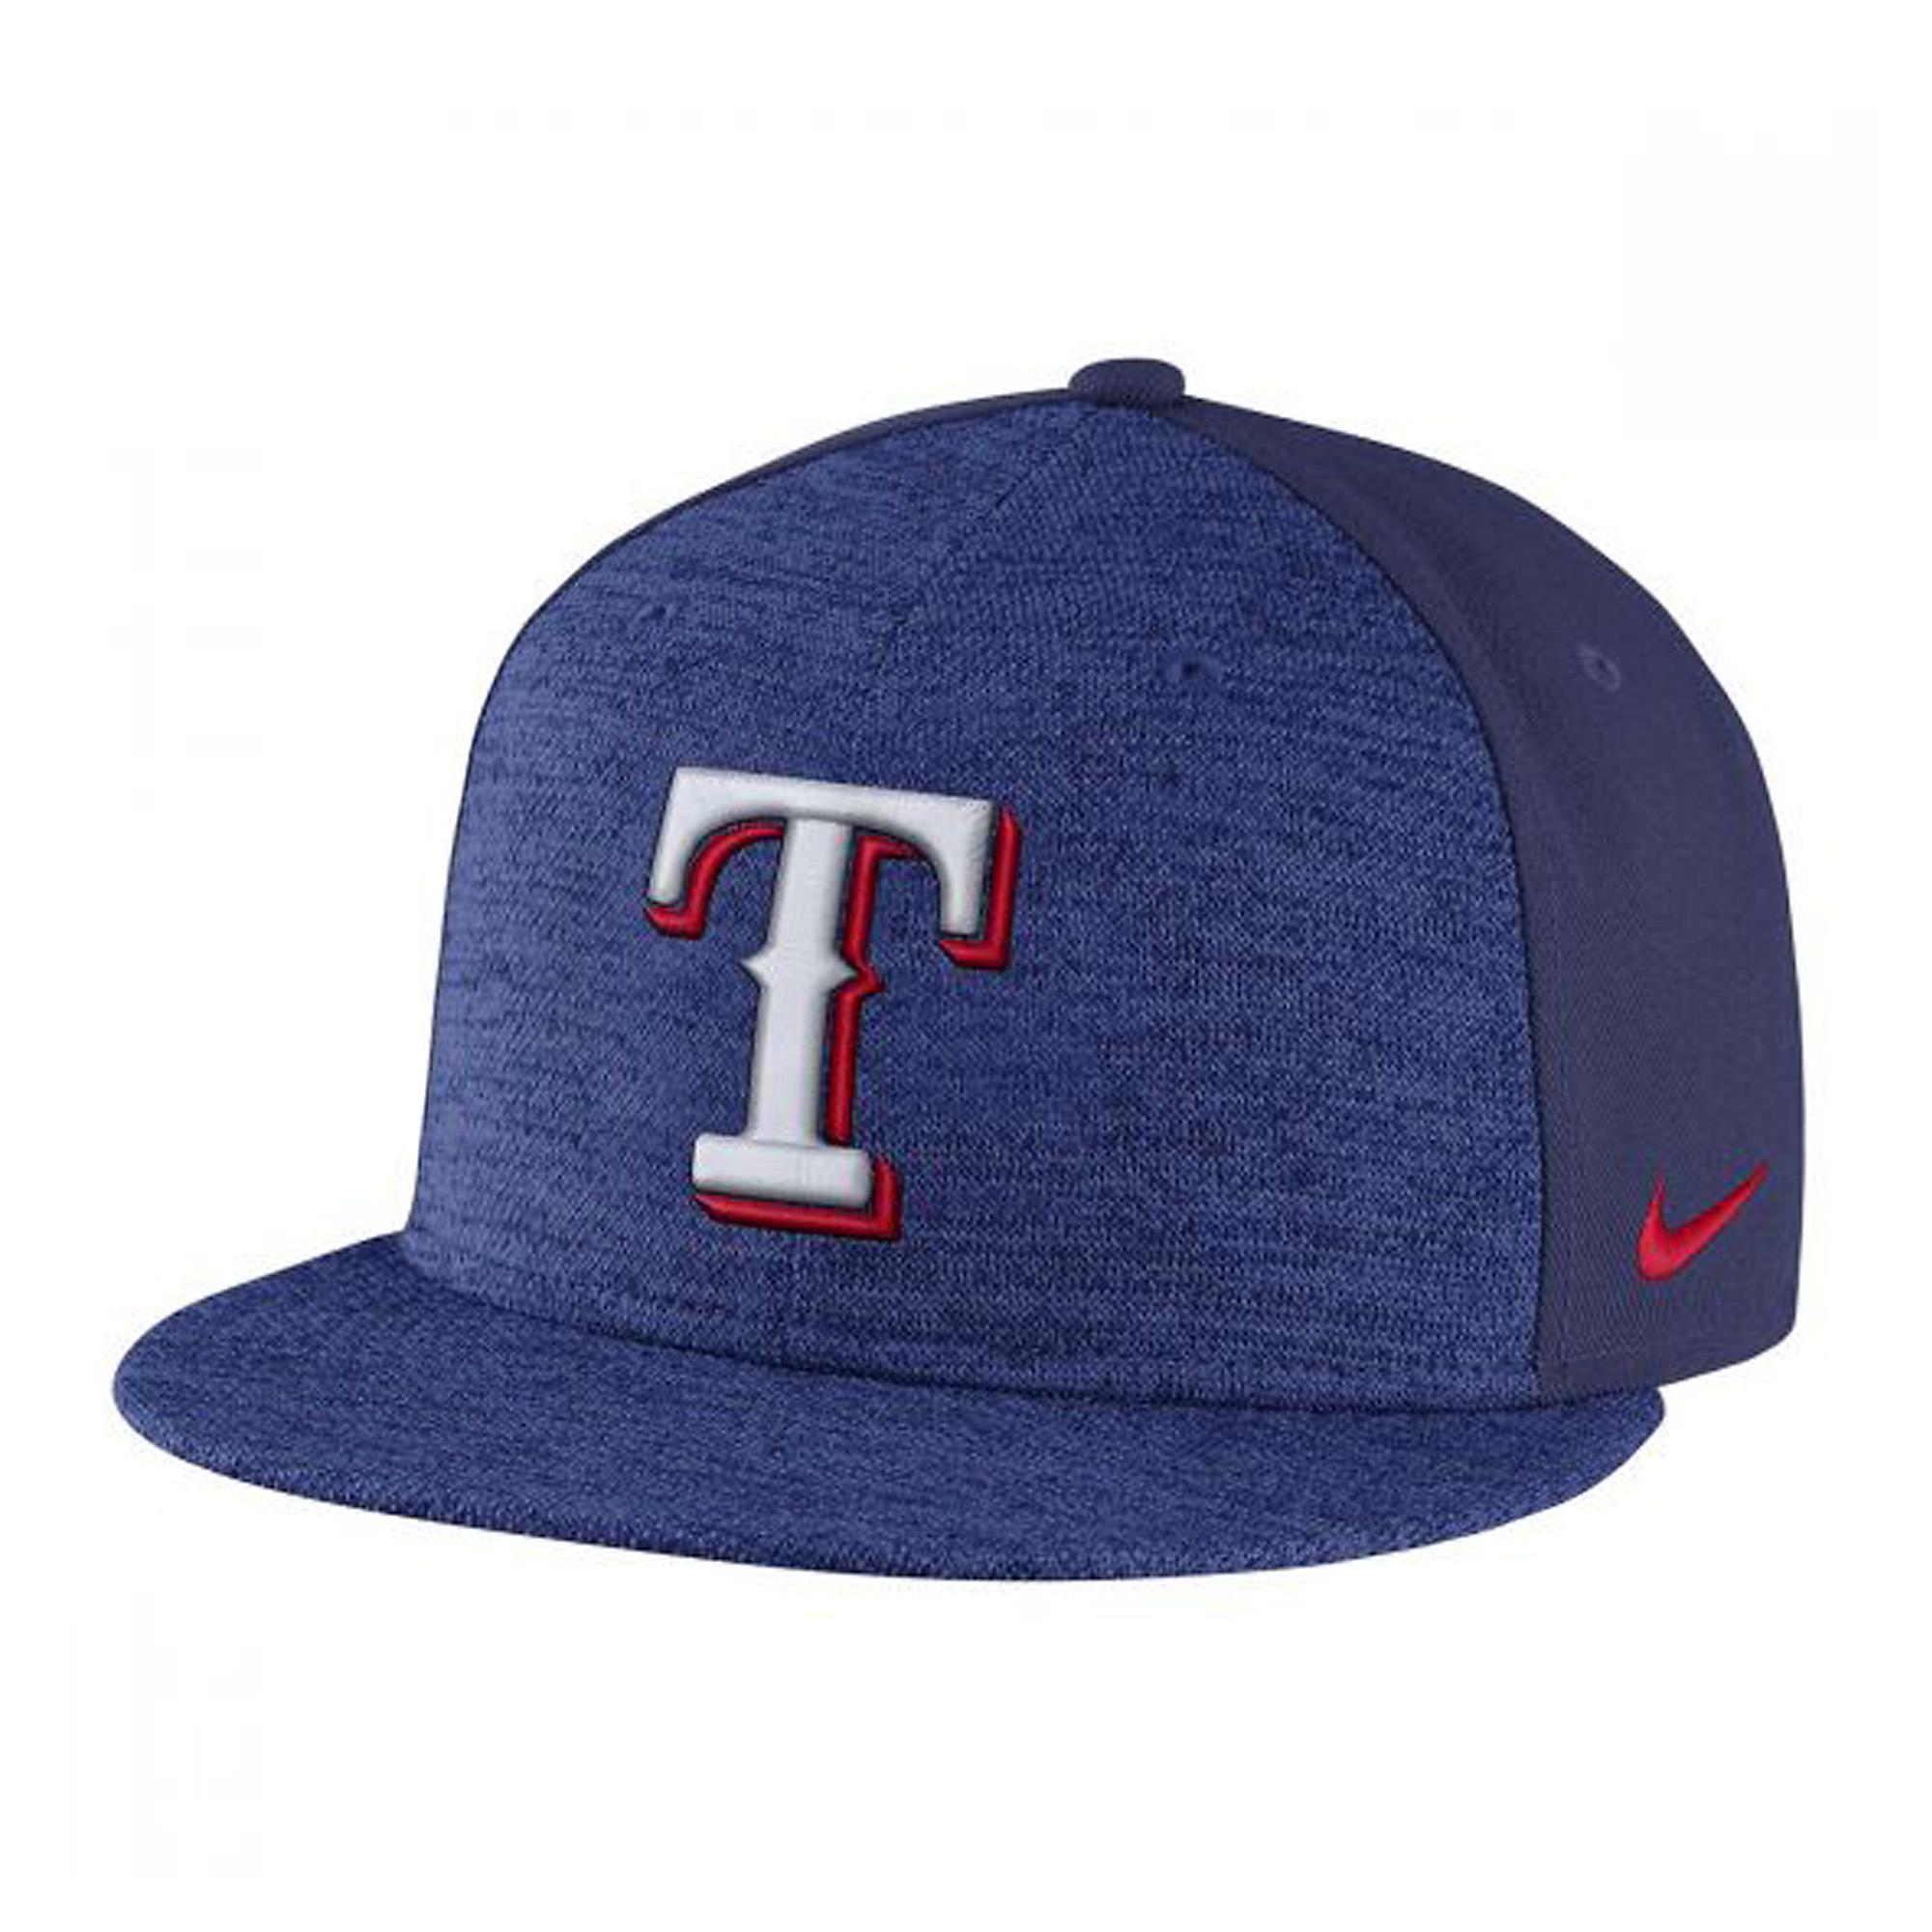 Texas Rangers Nike New Day Snapback Hat